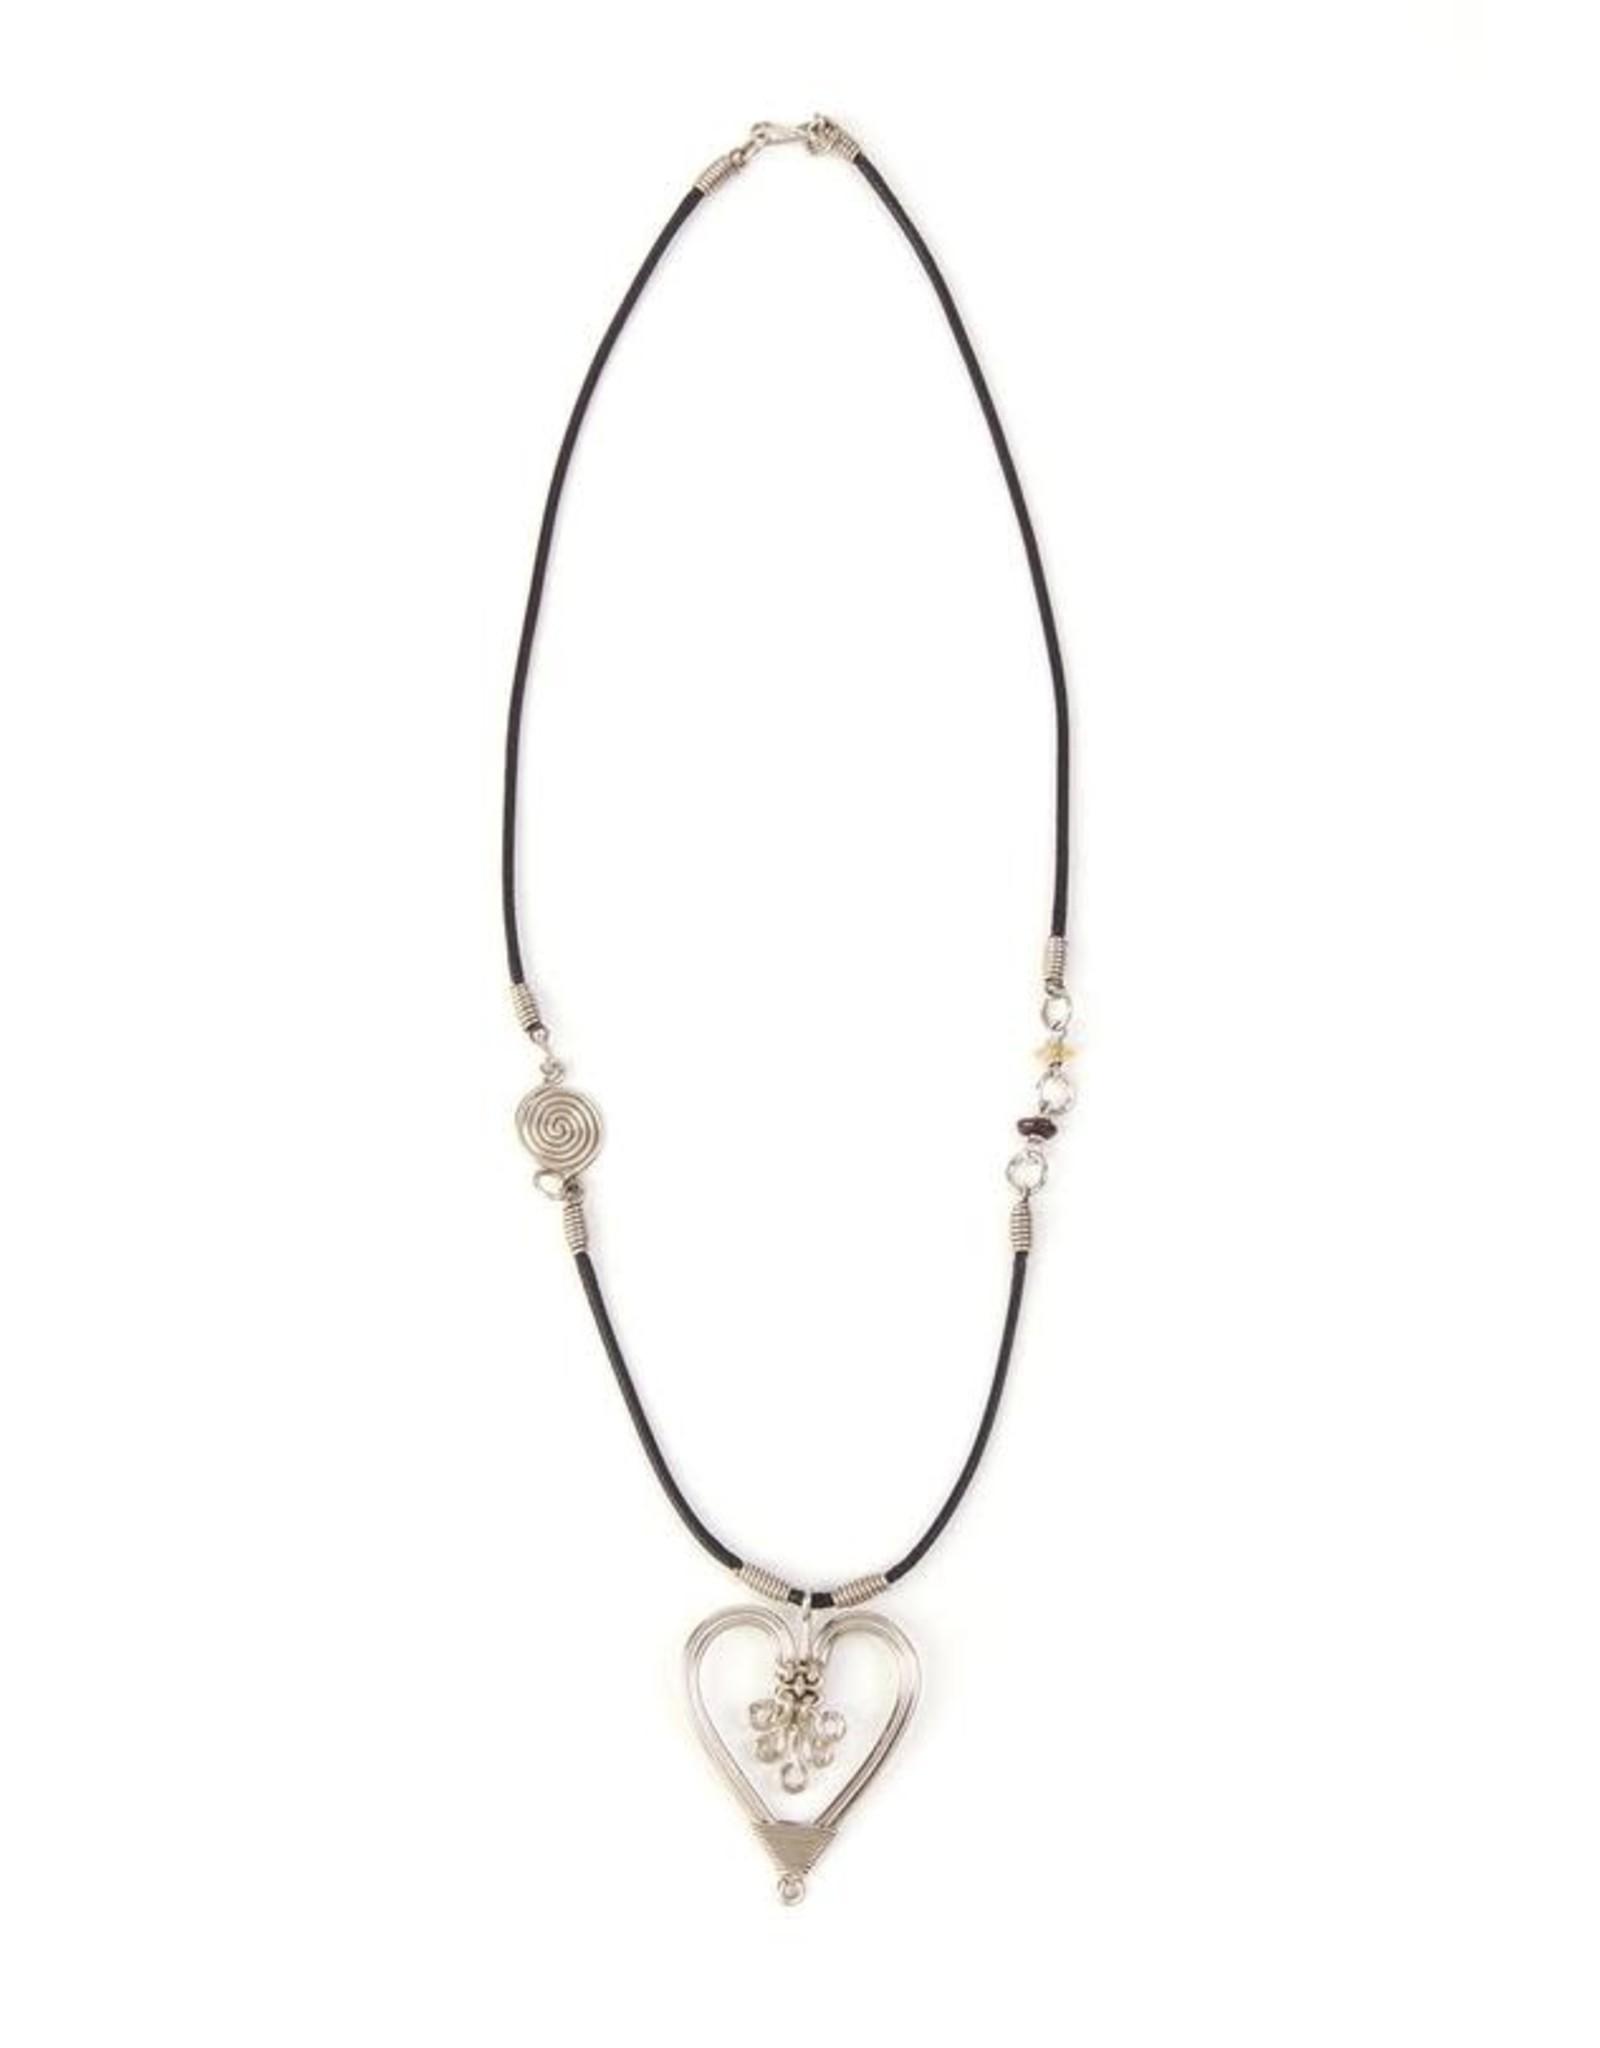 Swahili Wholesale Intricate Heart Necklace, Kenya